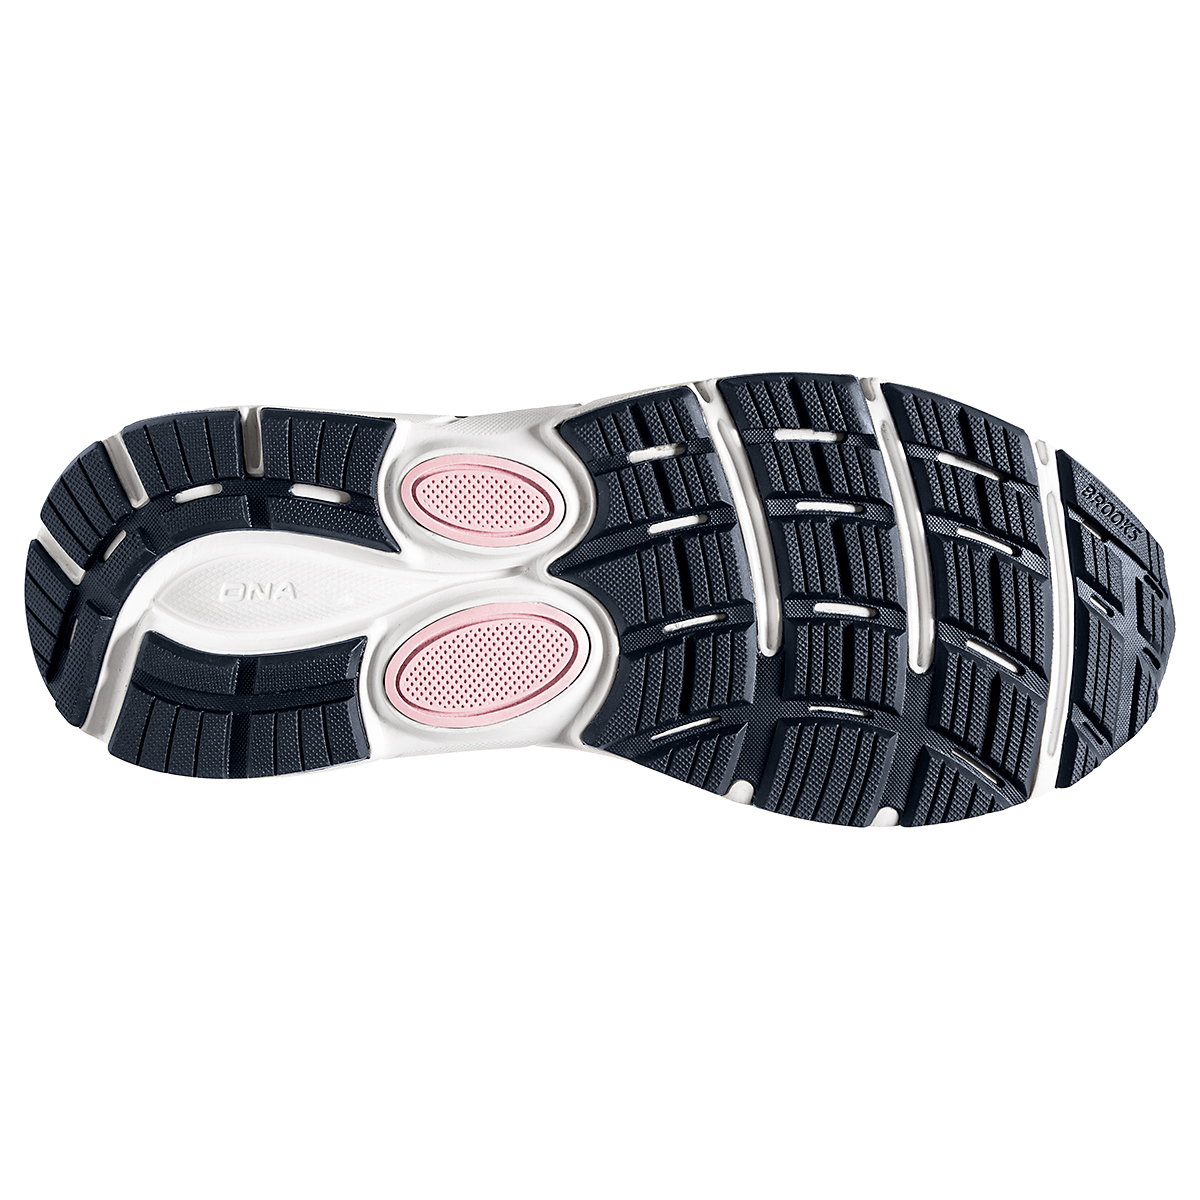 Women's Brooks Dyad 11 Running Shoe - Color: Ombre/Primrose  - Size: 6 - Width: Regular, Ombre/Primrose, large, image 6